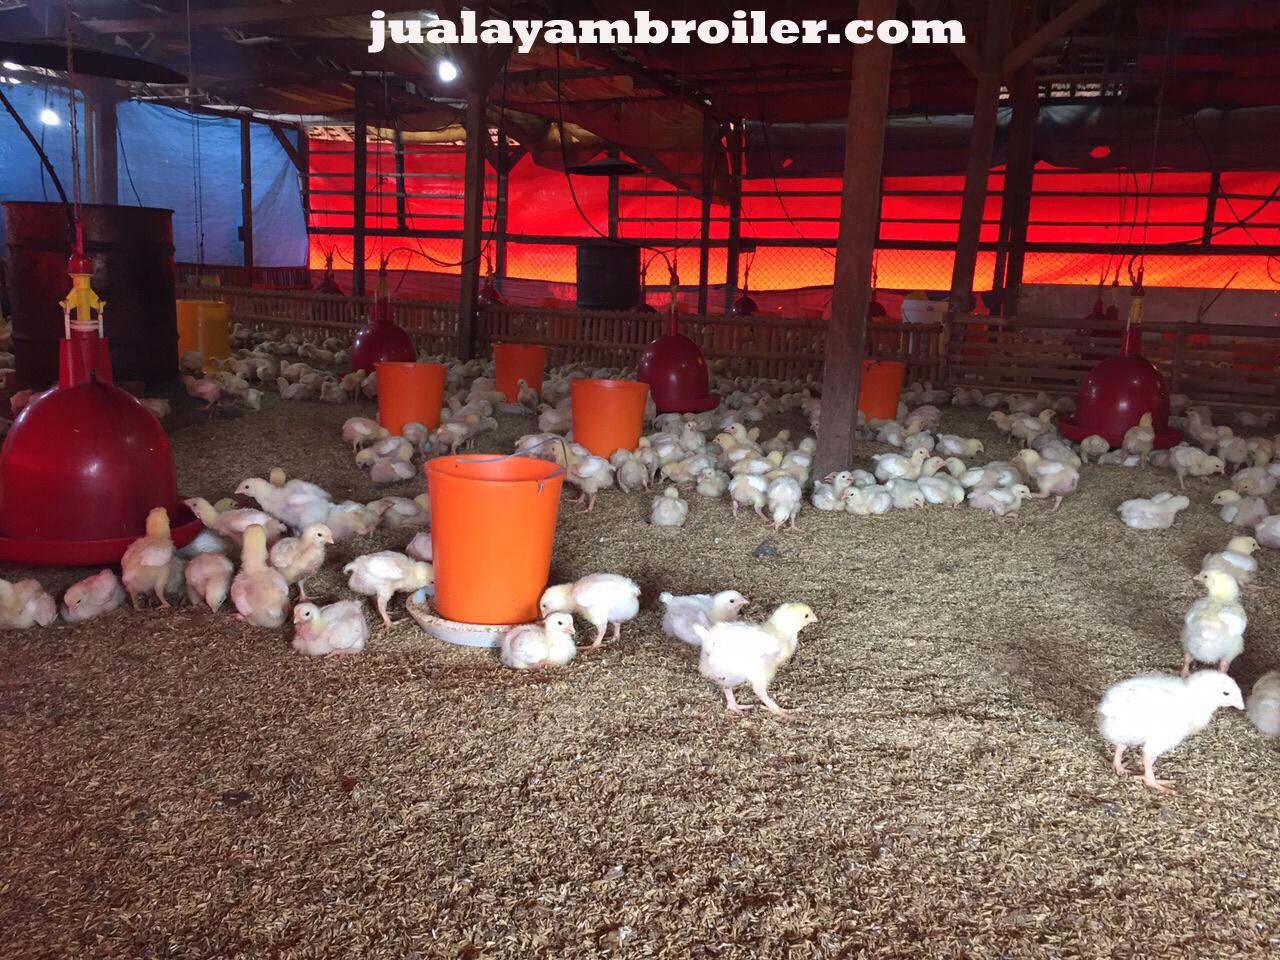 Jual Ayam Broiler di Utan Kayu Jakarta Timur